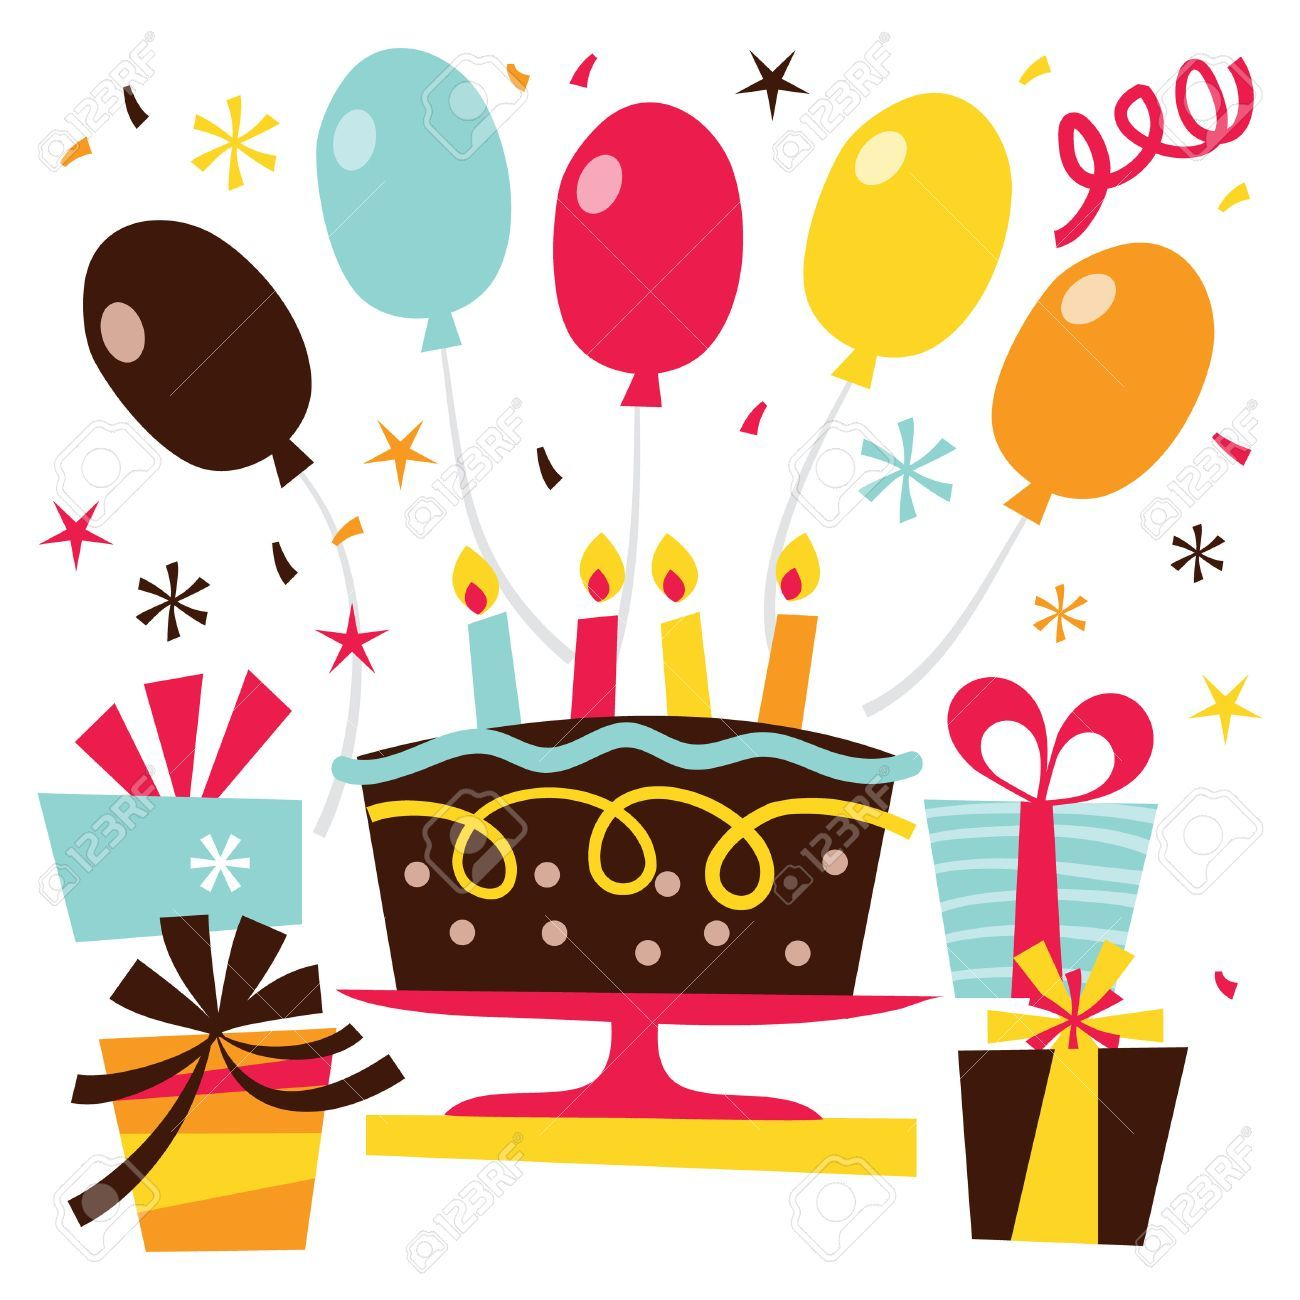 Surprise birthday pictures clipart clip black and white library Clipart surprise birthday party 5 » Clipart Portal clip black and white library